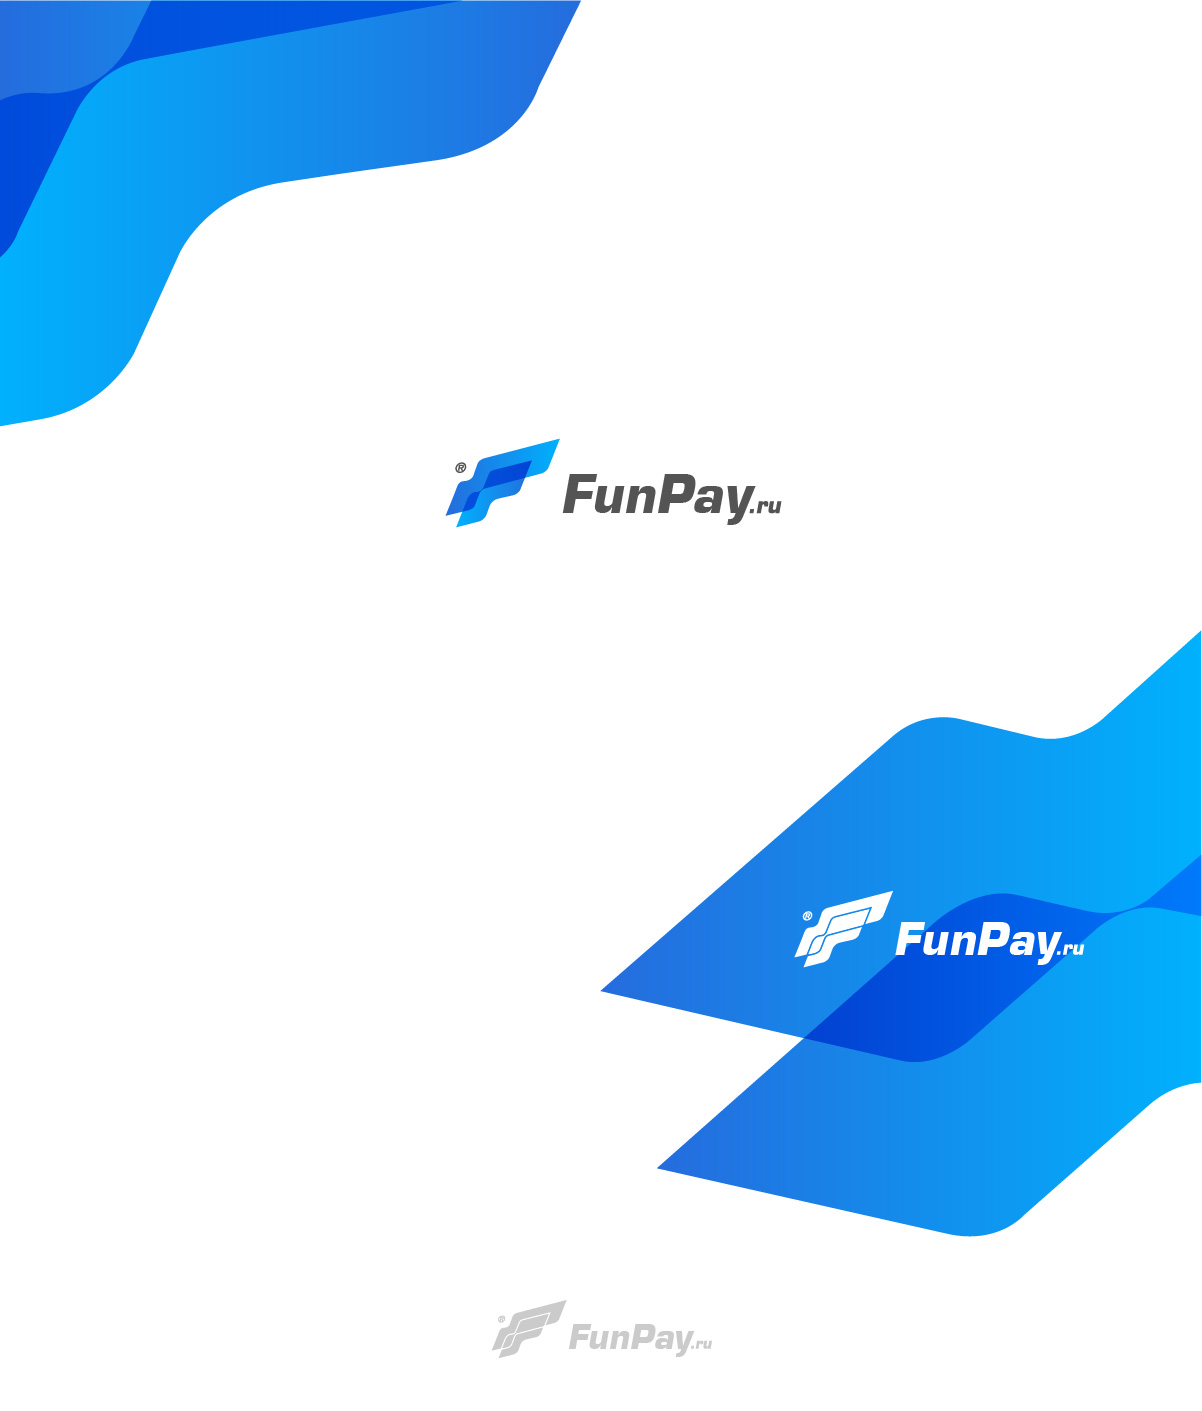 Логотип для FunPay.ru фото f_019599f437518386.jpg